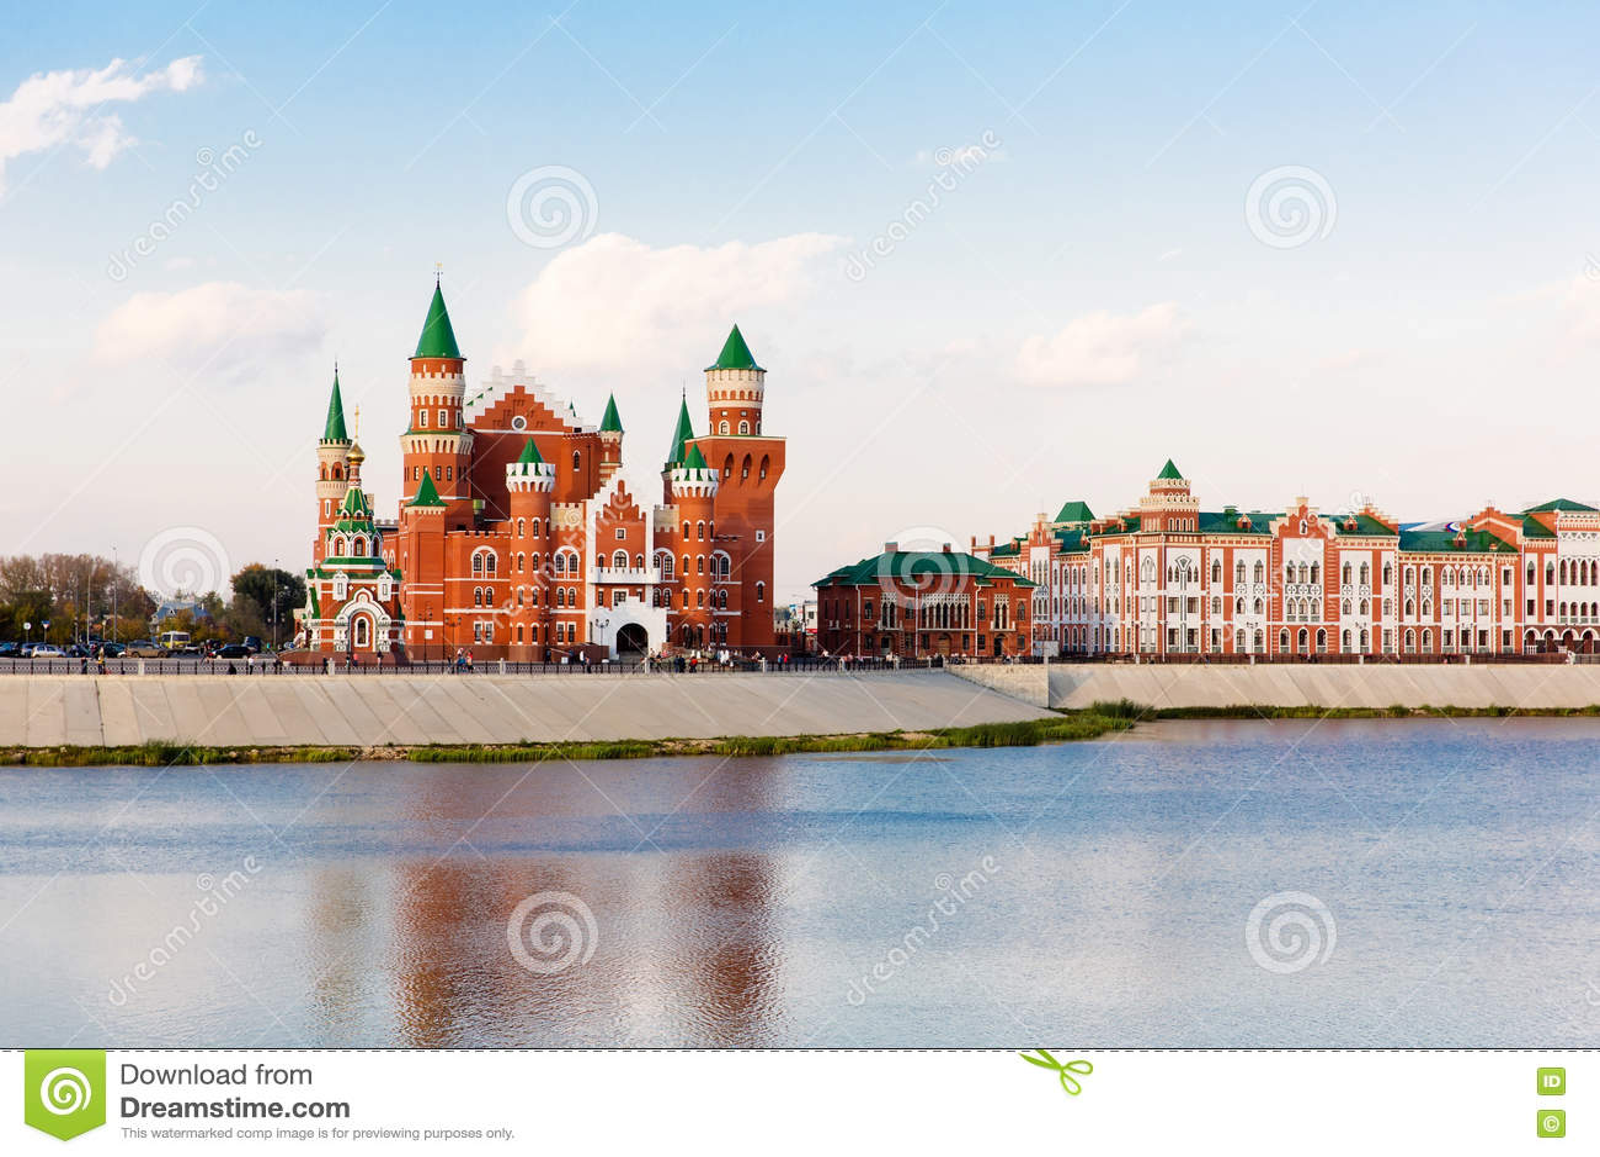 Embankment in Yoshkar-Ola. Russia